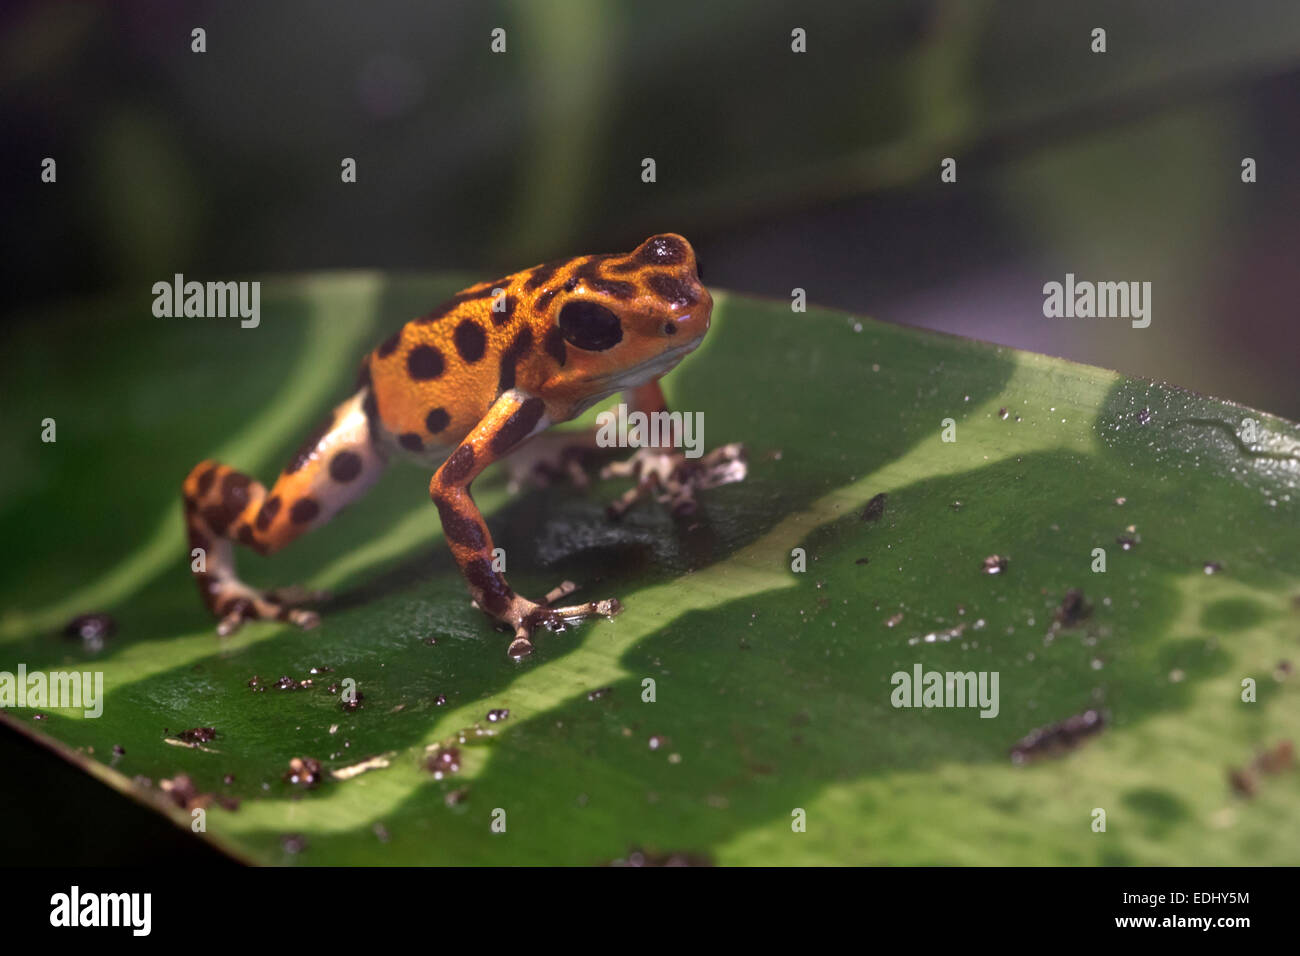 Strawberry Poison-dart frog - Stock Image